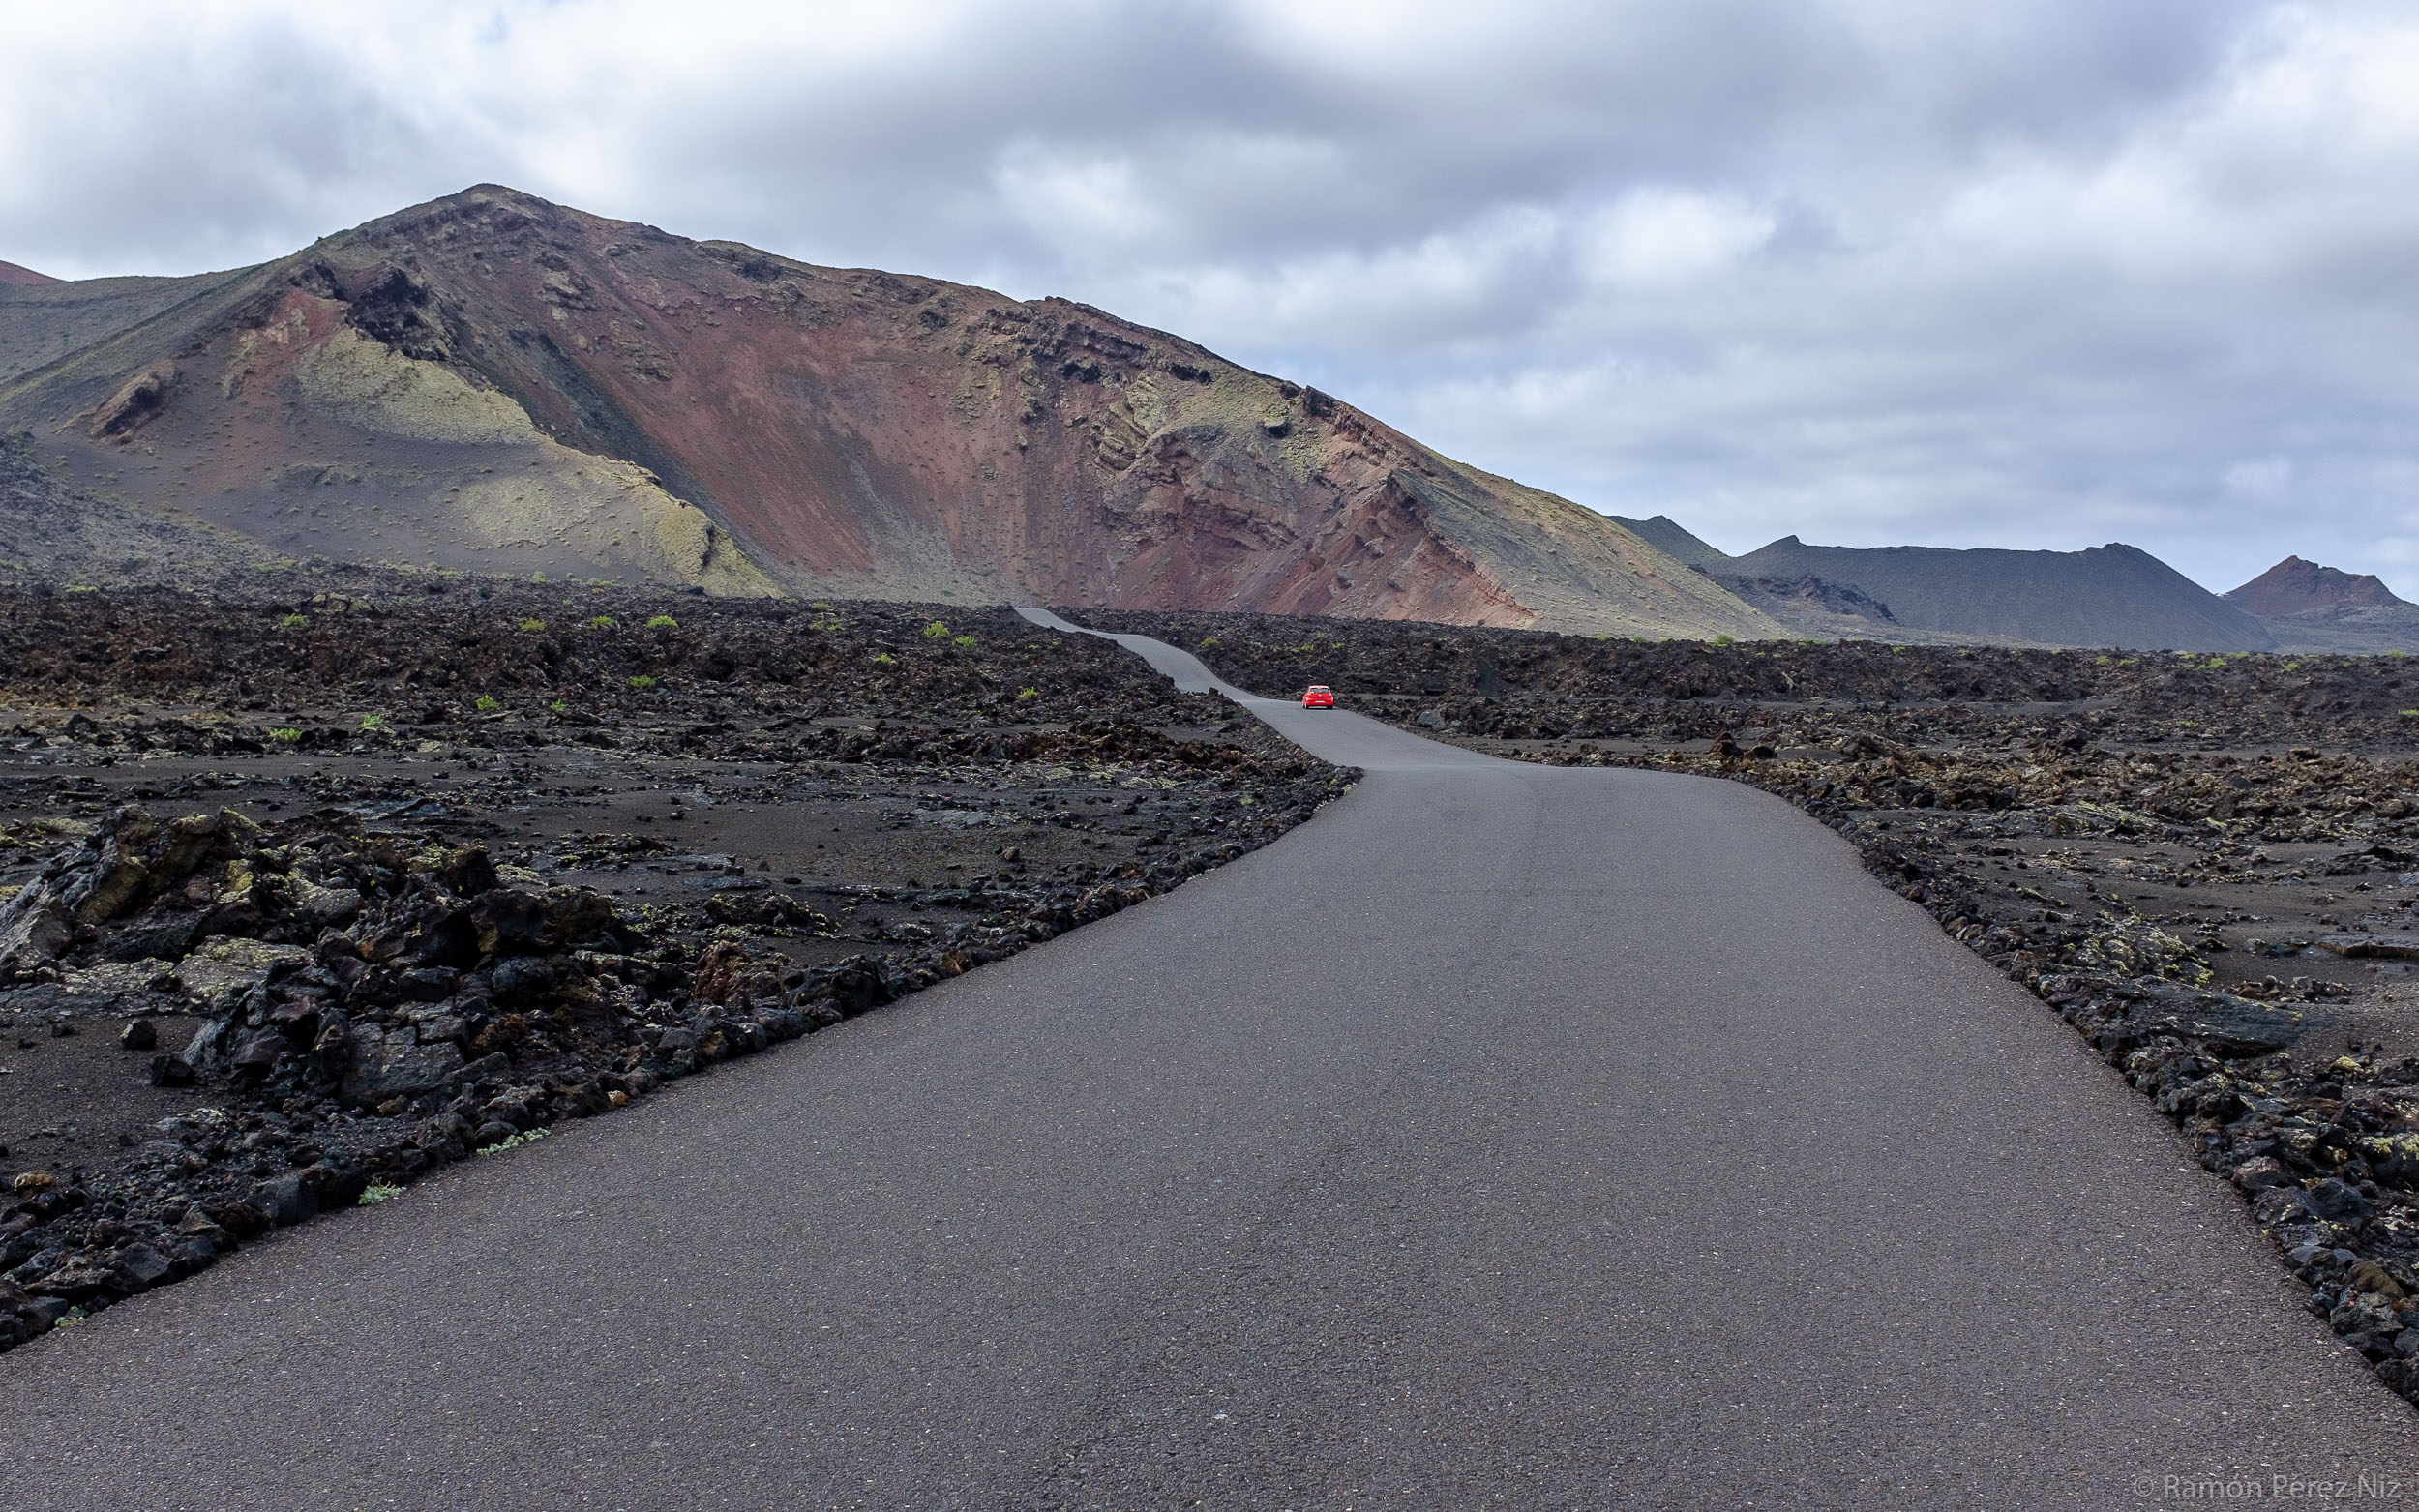 Foto de Ramón Pérez Niz, carretera al islote de Hilario I